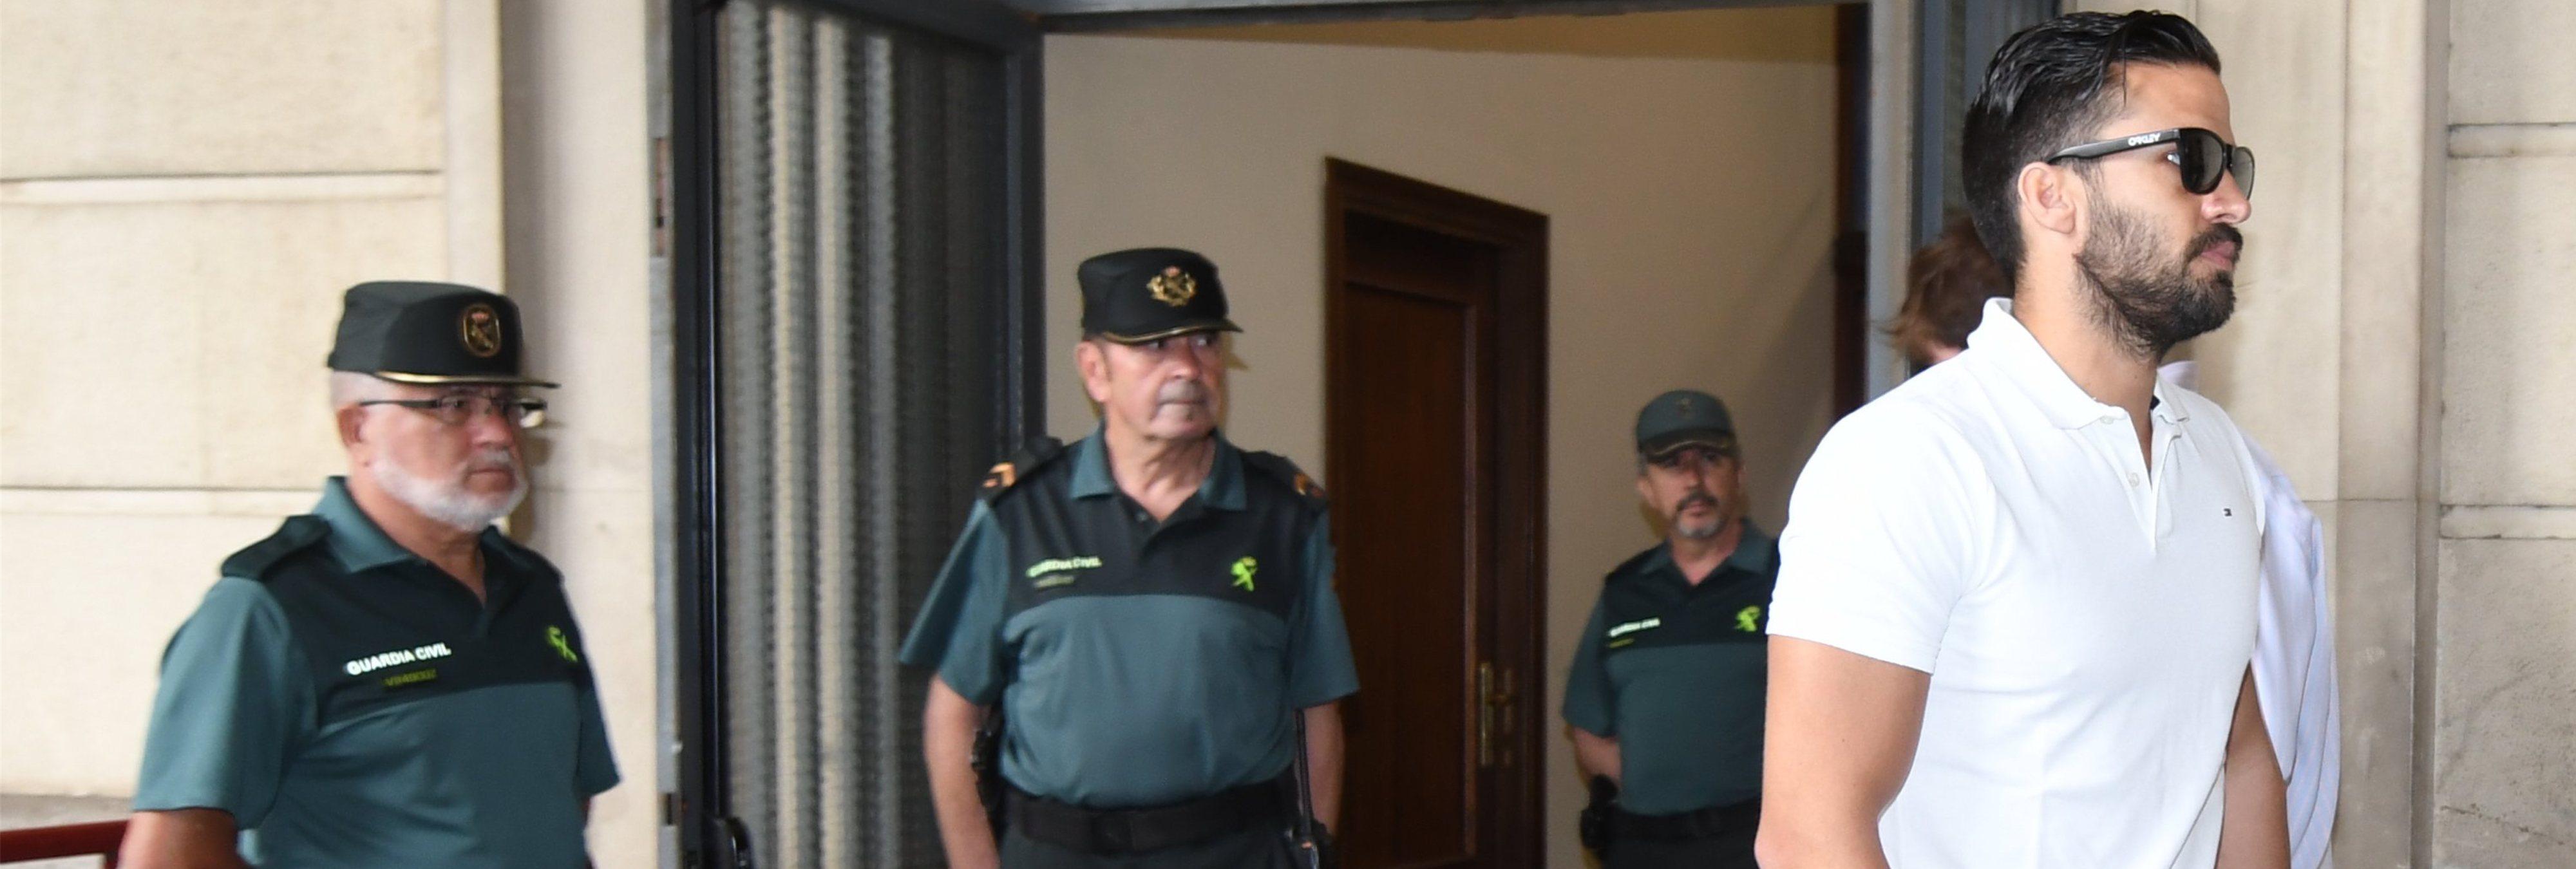 La Guardia Civil prohíbe al agente de 'La Manada' solicitar destino